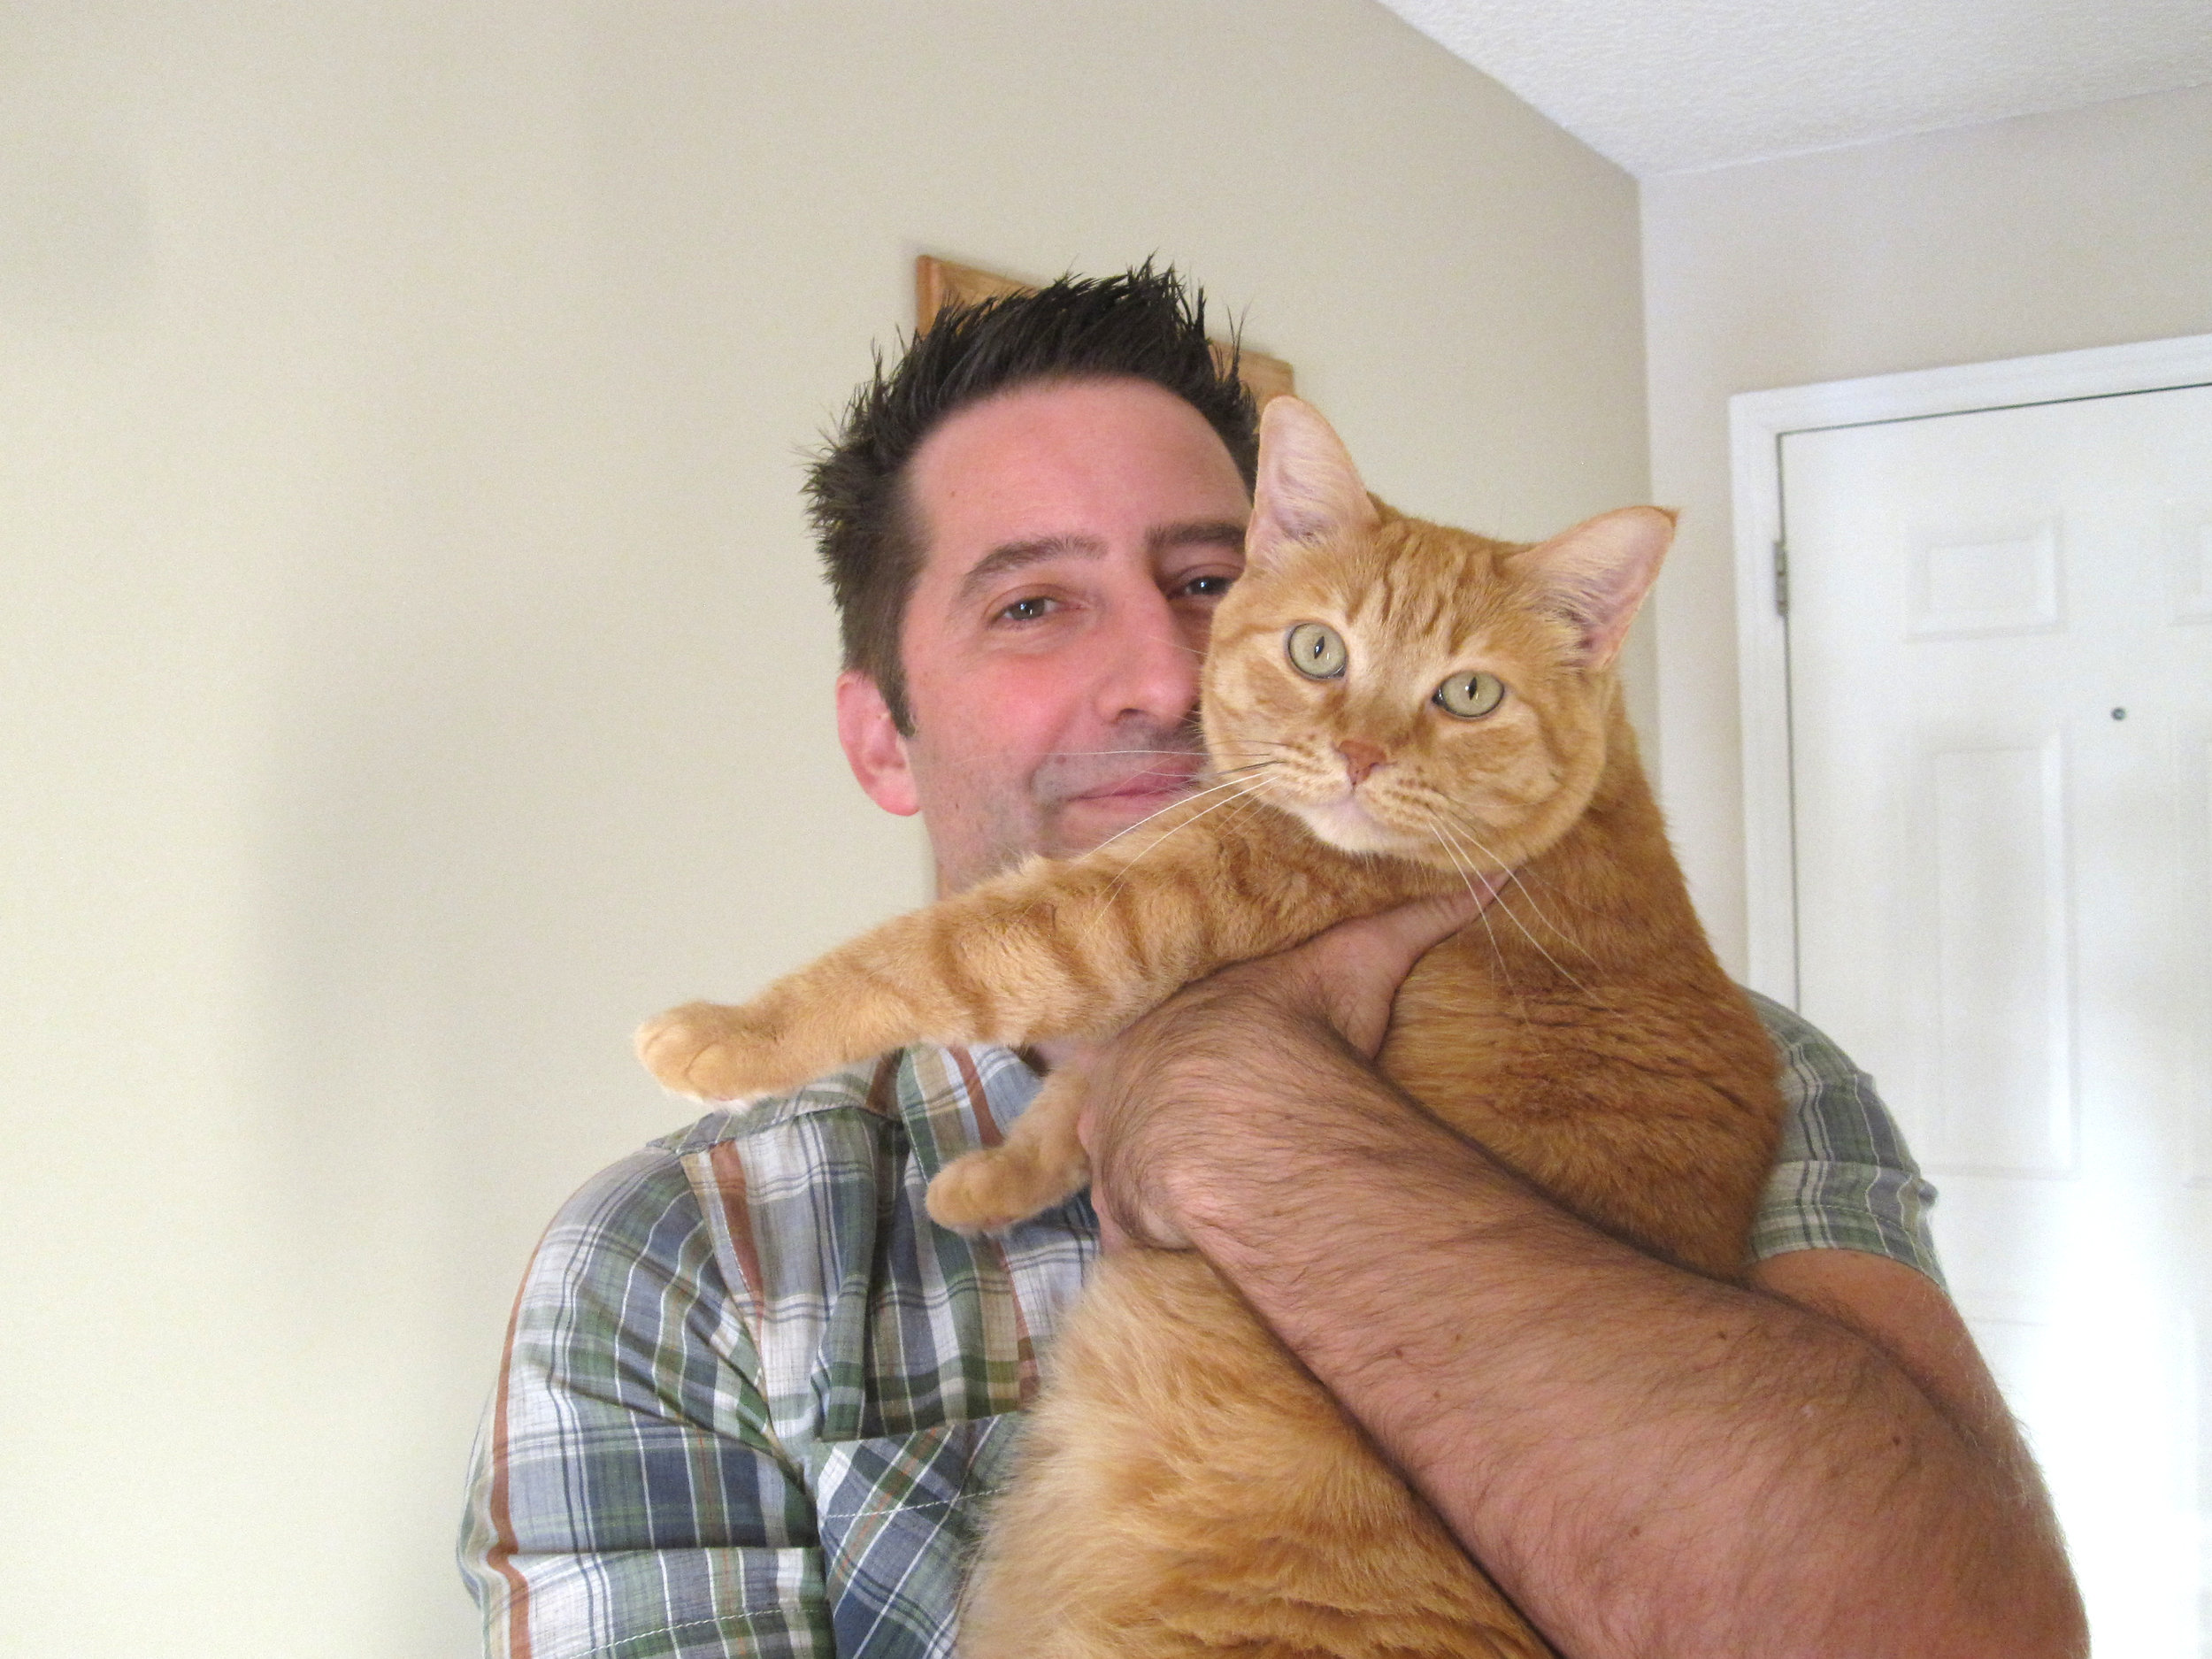 Our cat Valentino